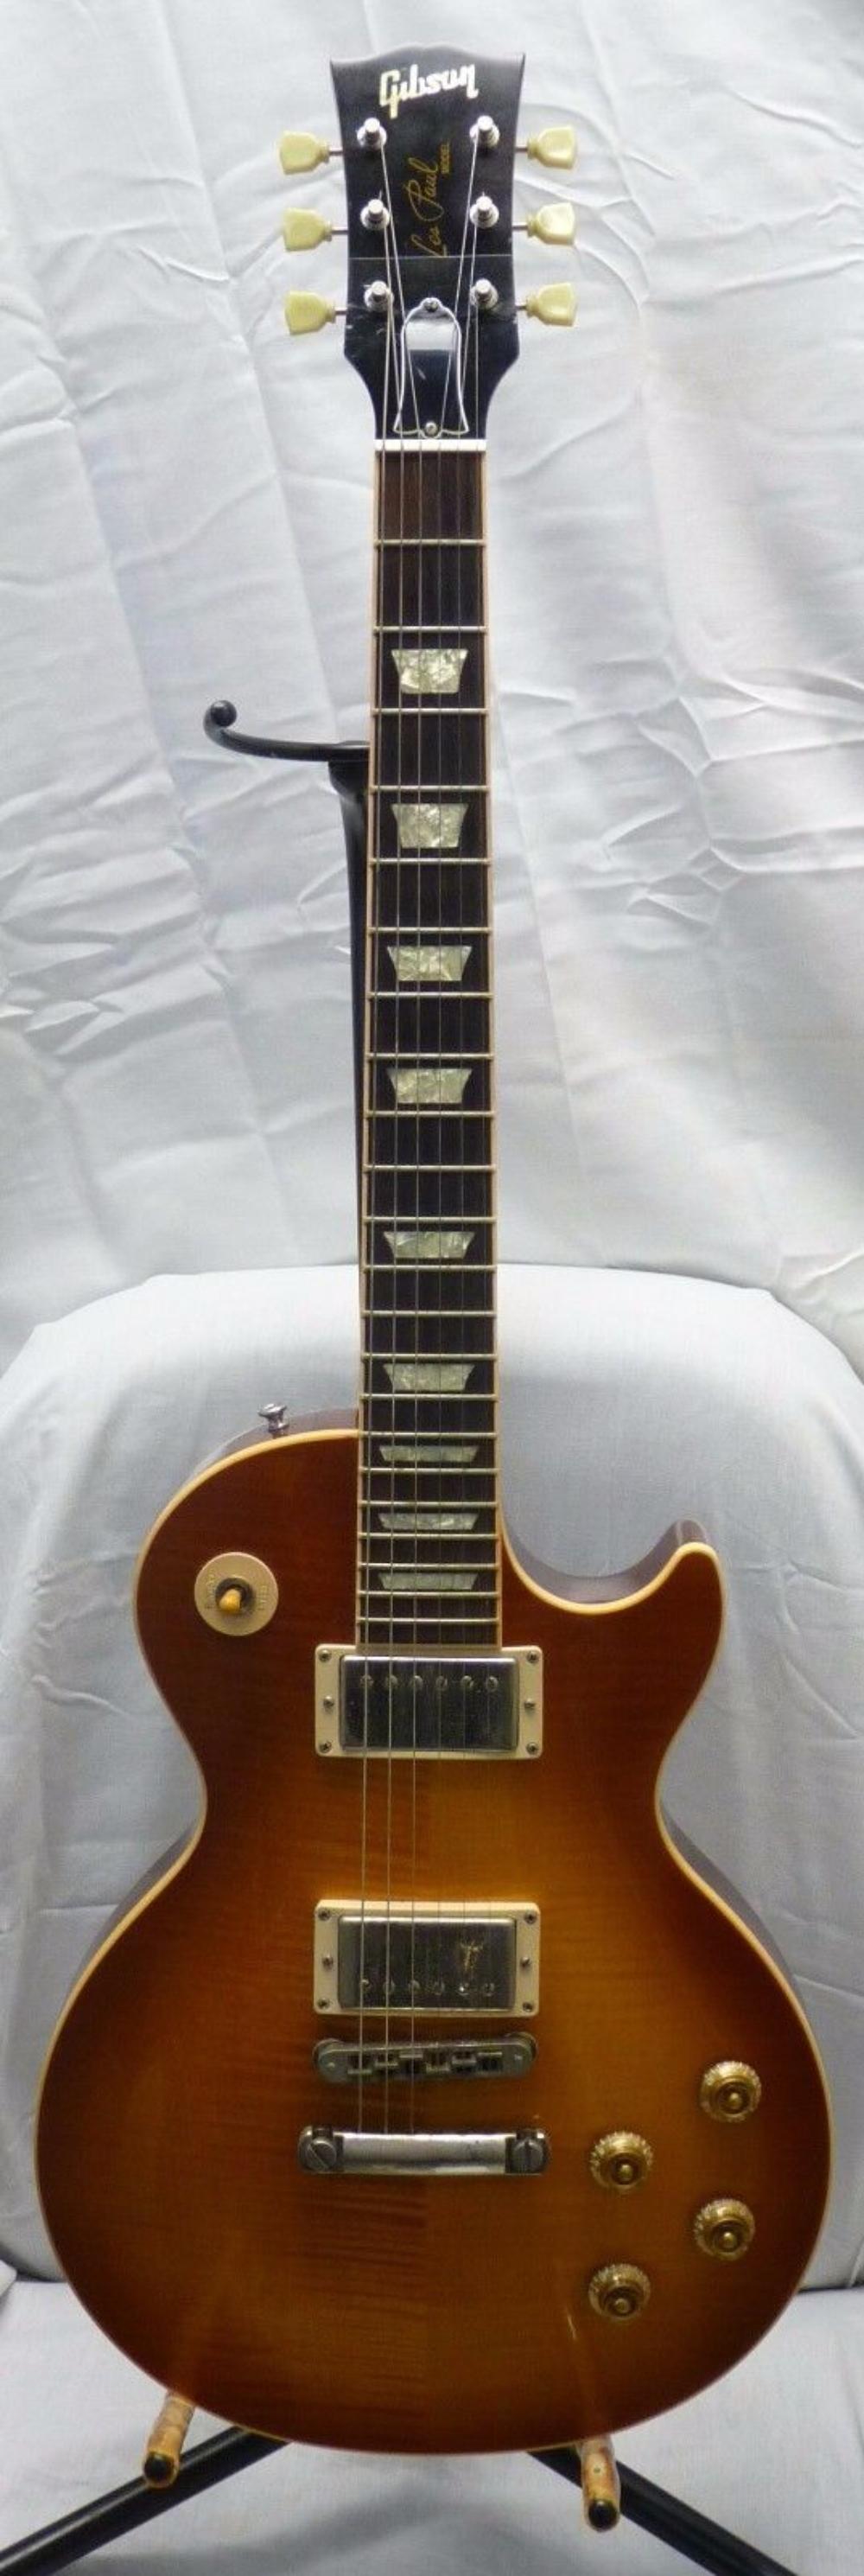 GIBSON LES PAUL Honeyburst 2004 Electric Guitar Hard Case